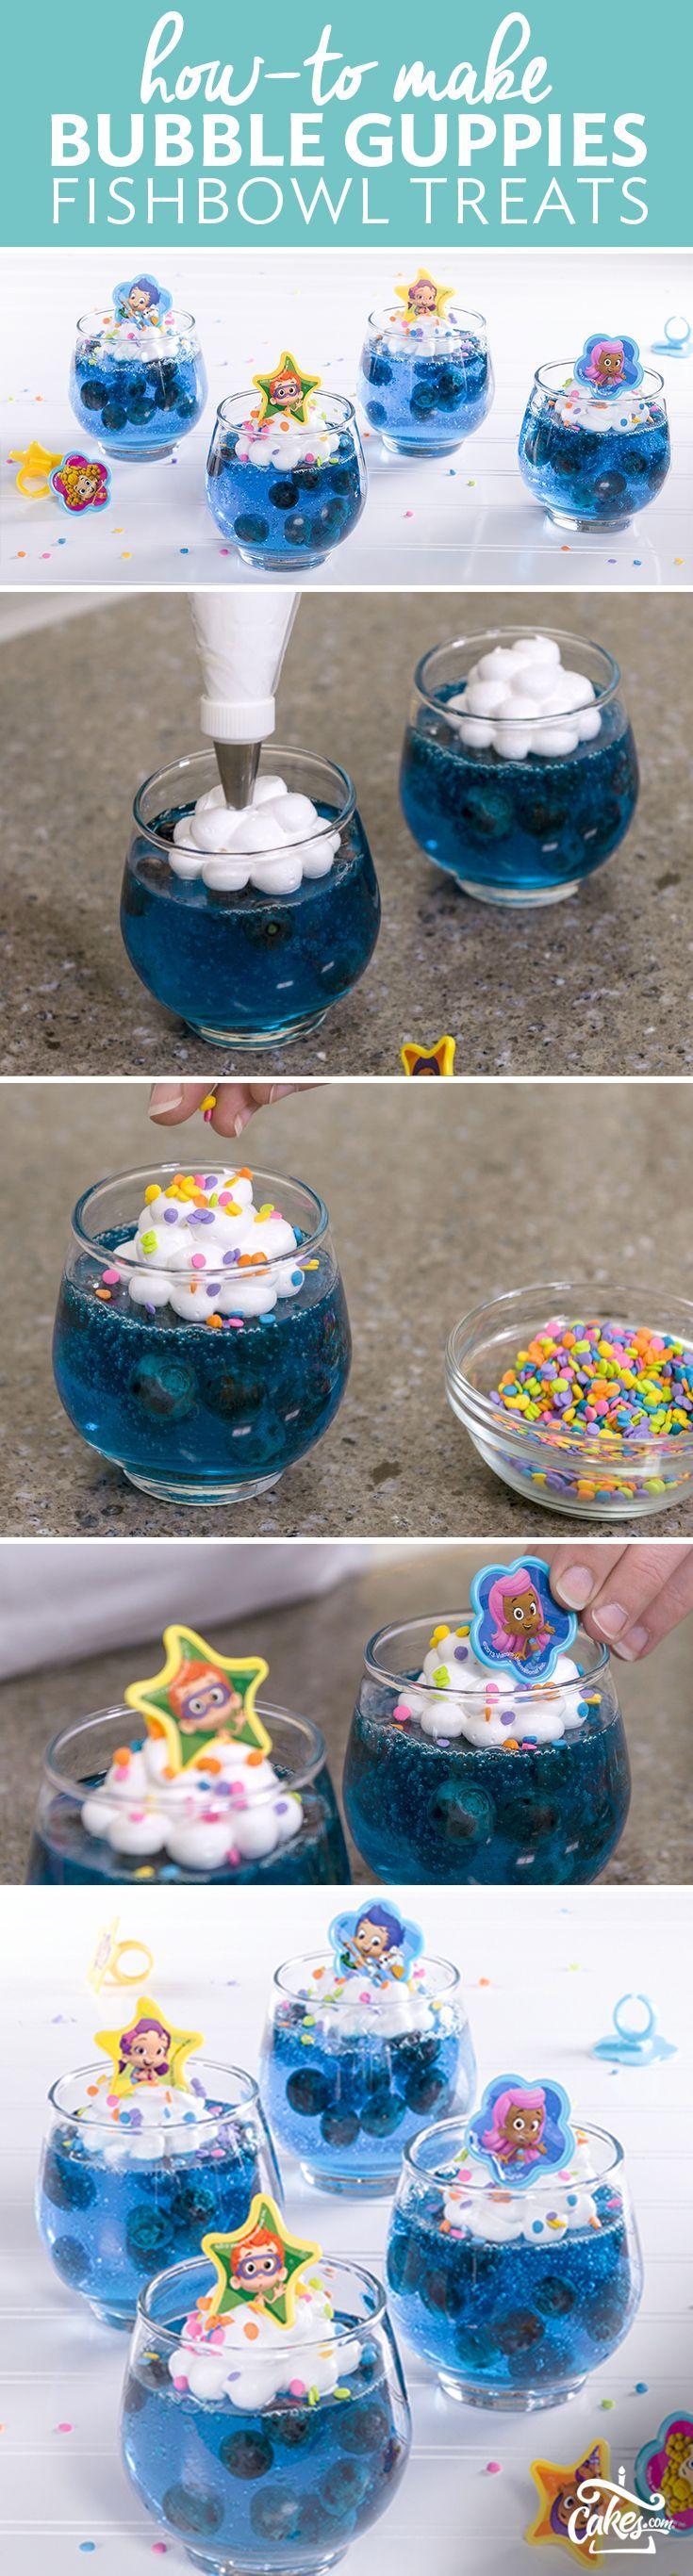 How-To Make Bubble Guppies Gelatin Fishbowl Birthday Treats